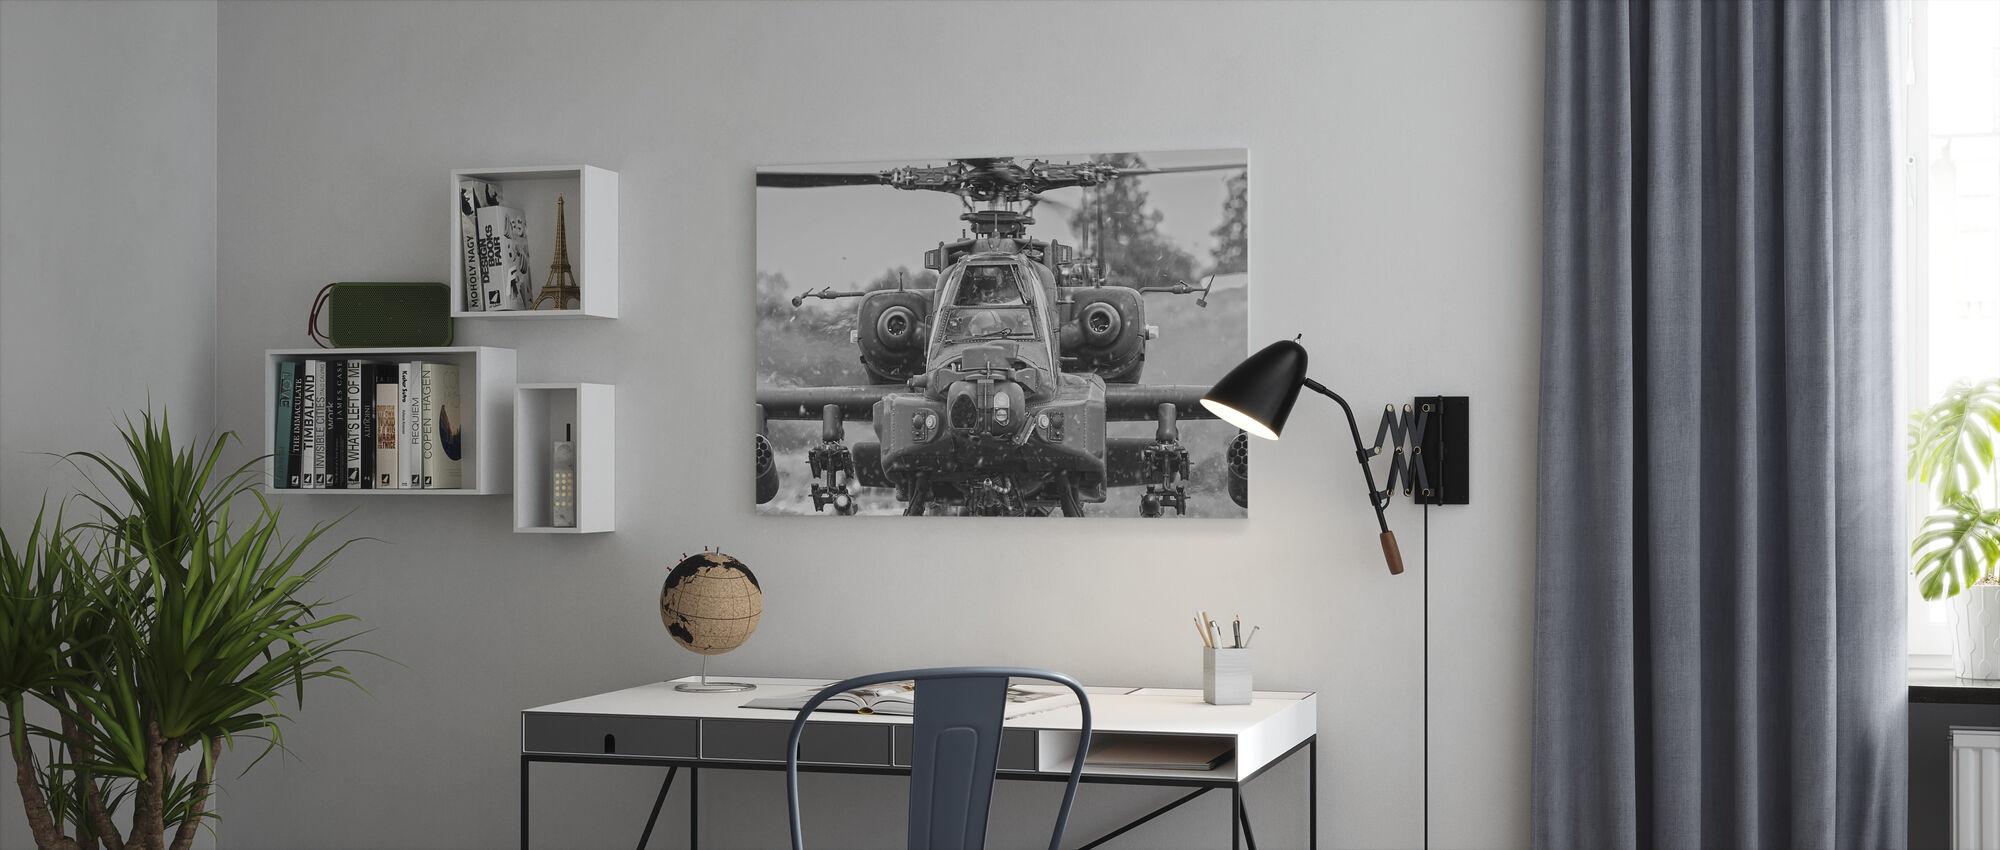 Apache Helikopter - Canvastavla - Kontor